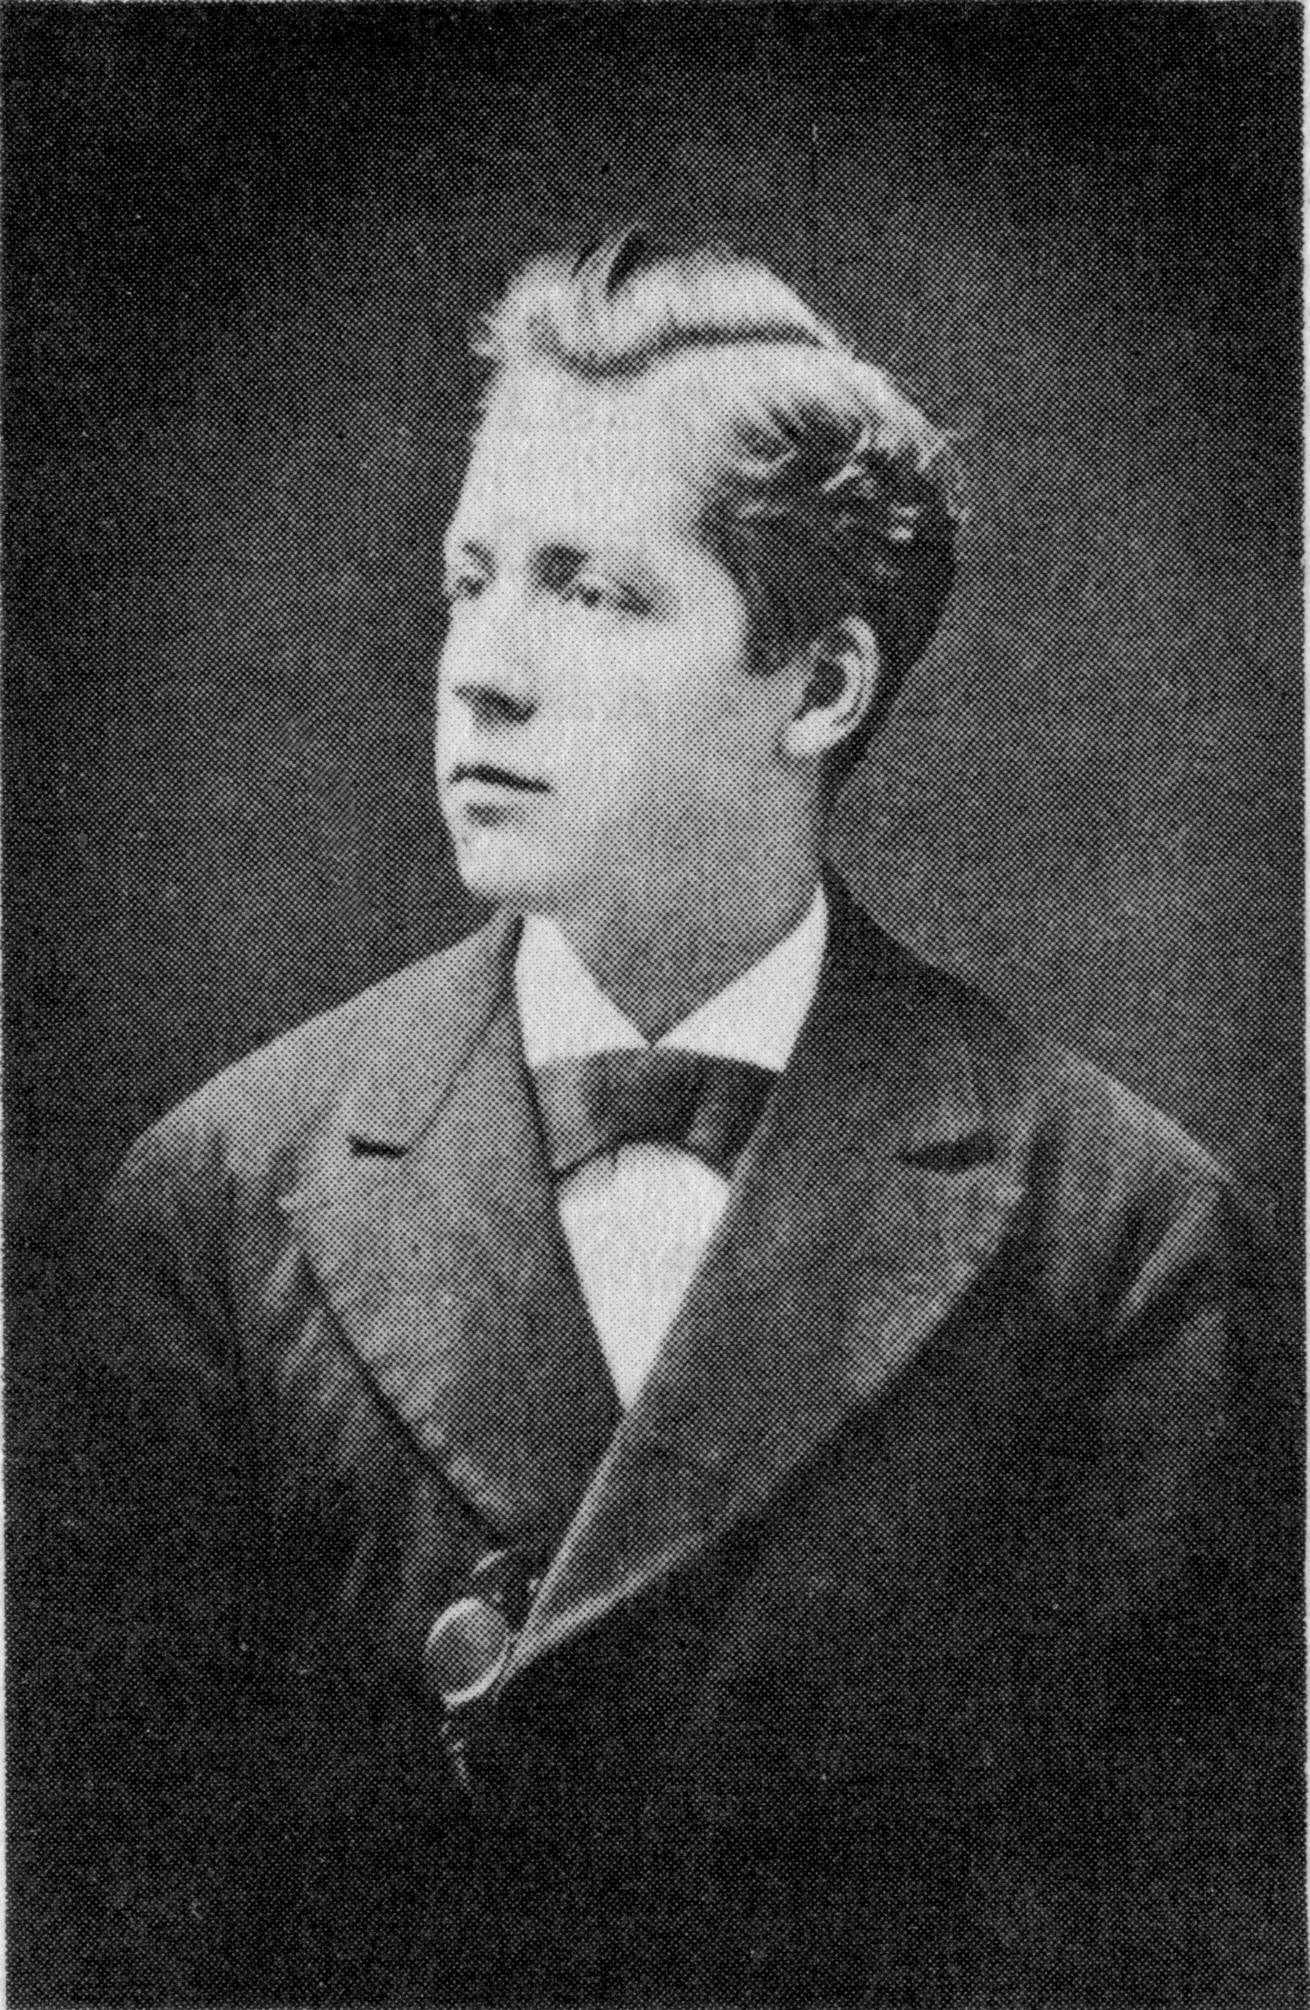 image of Arthur Rudolf Hantzsch